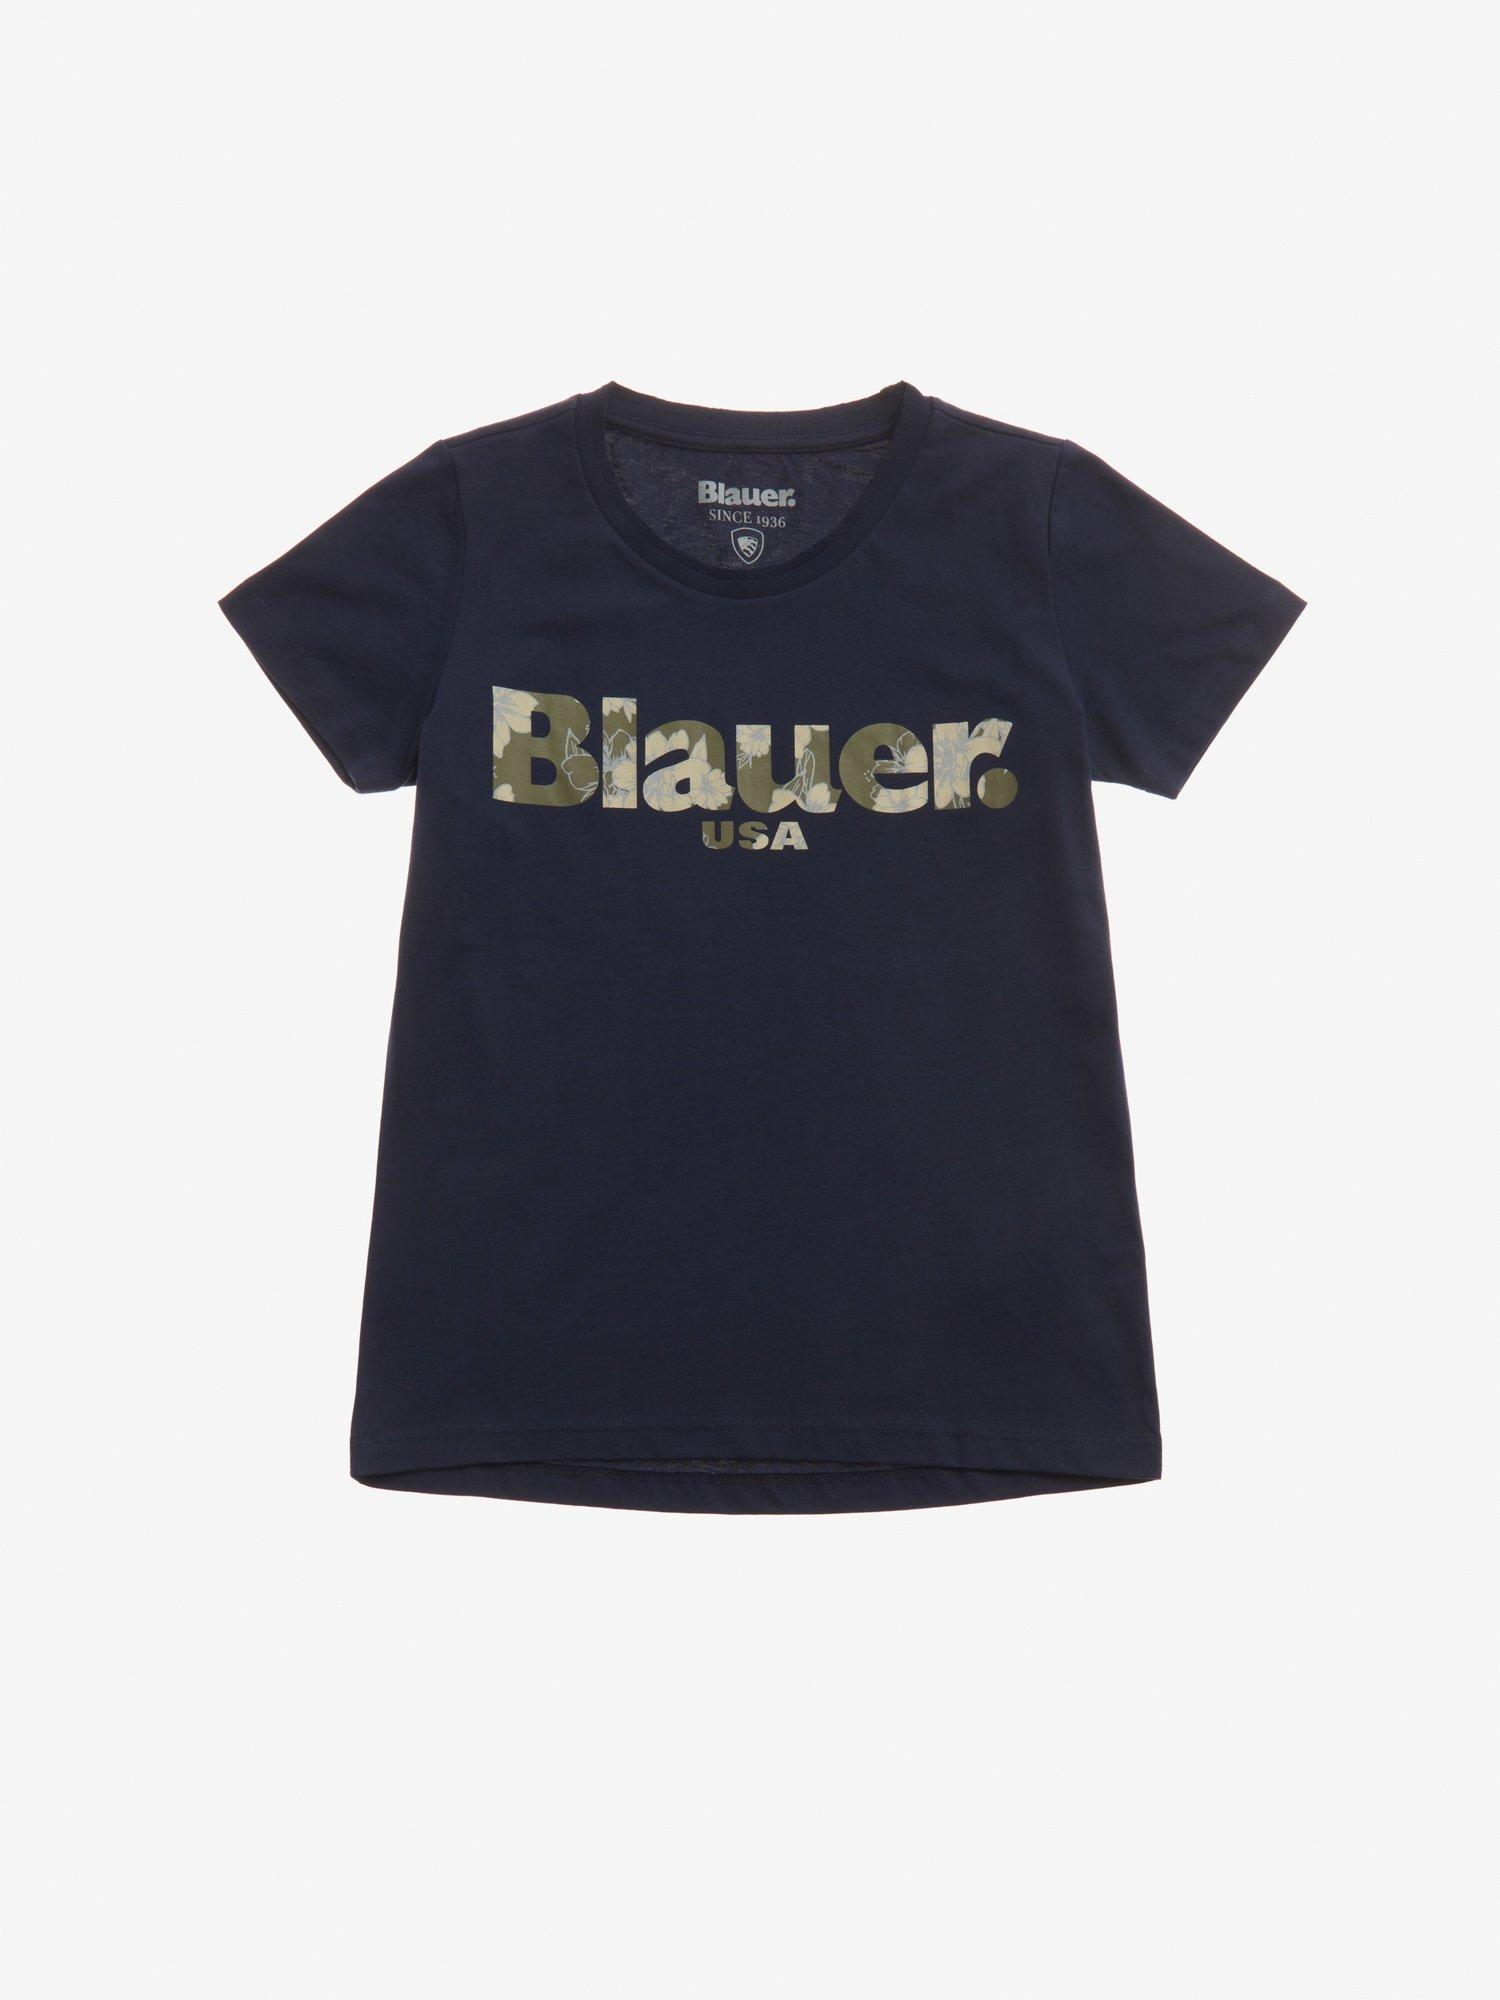 BLAUER FLORAL T-SHIRT - Blauer